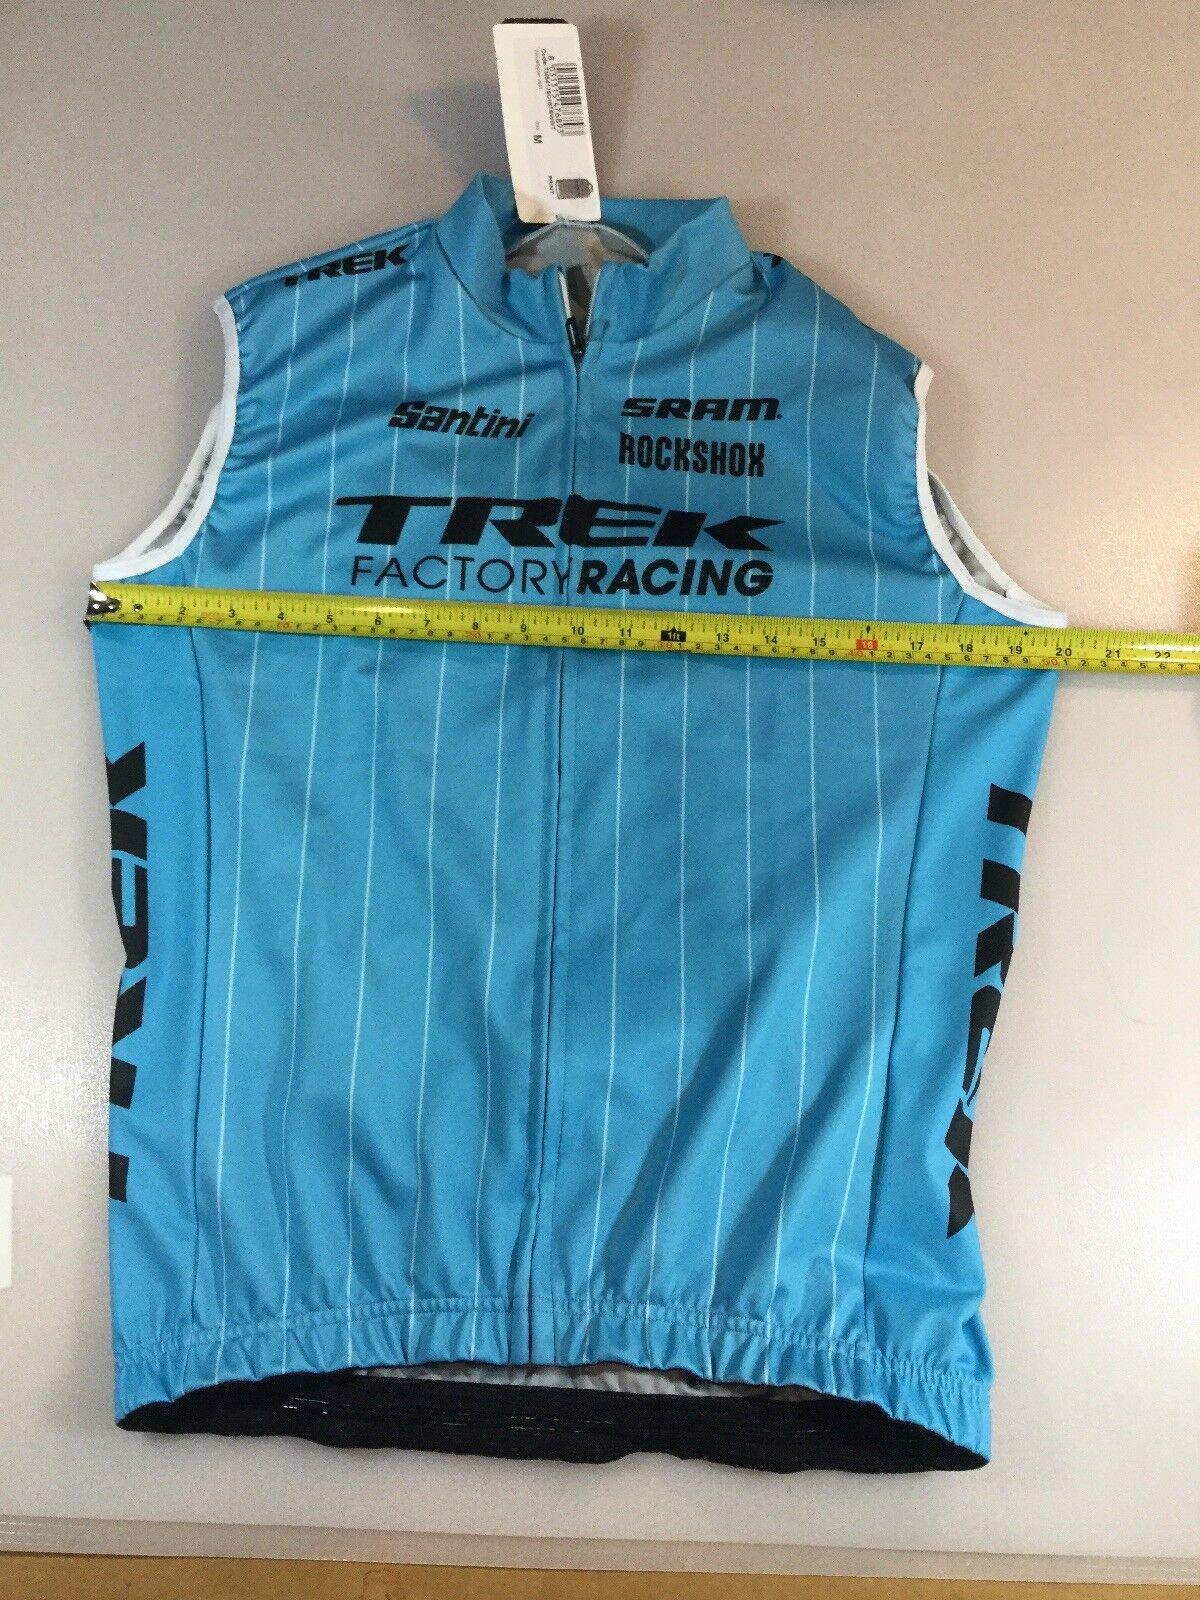 Sms Santini Trek Factory Racing Wind Vest Size Medium M  (6550-6)